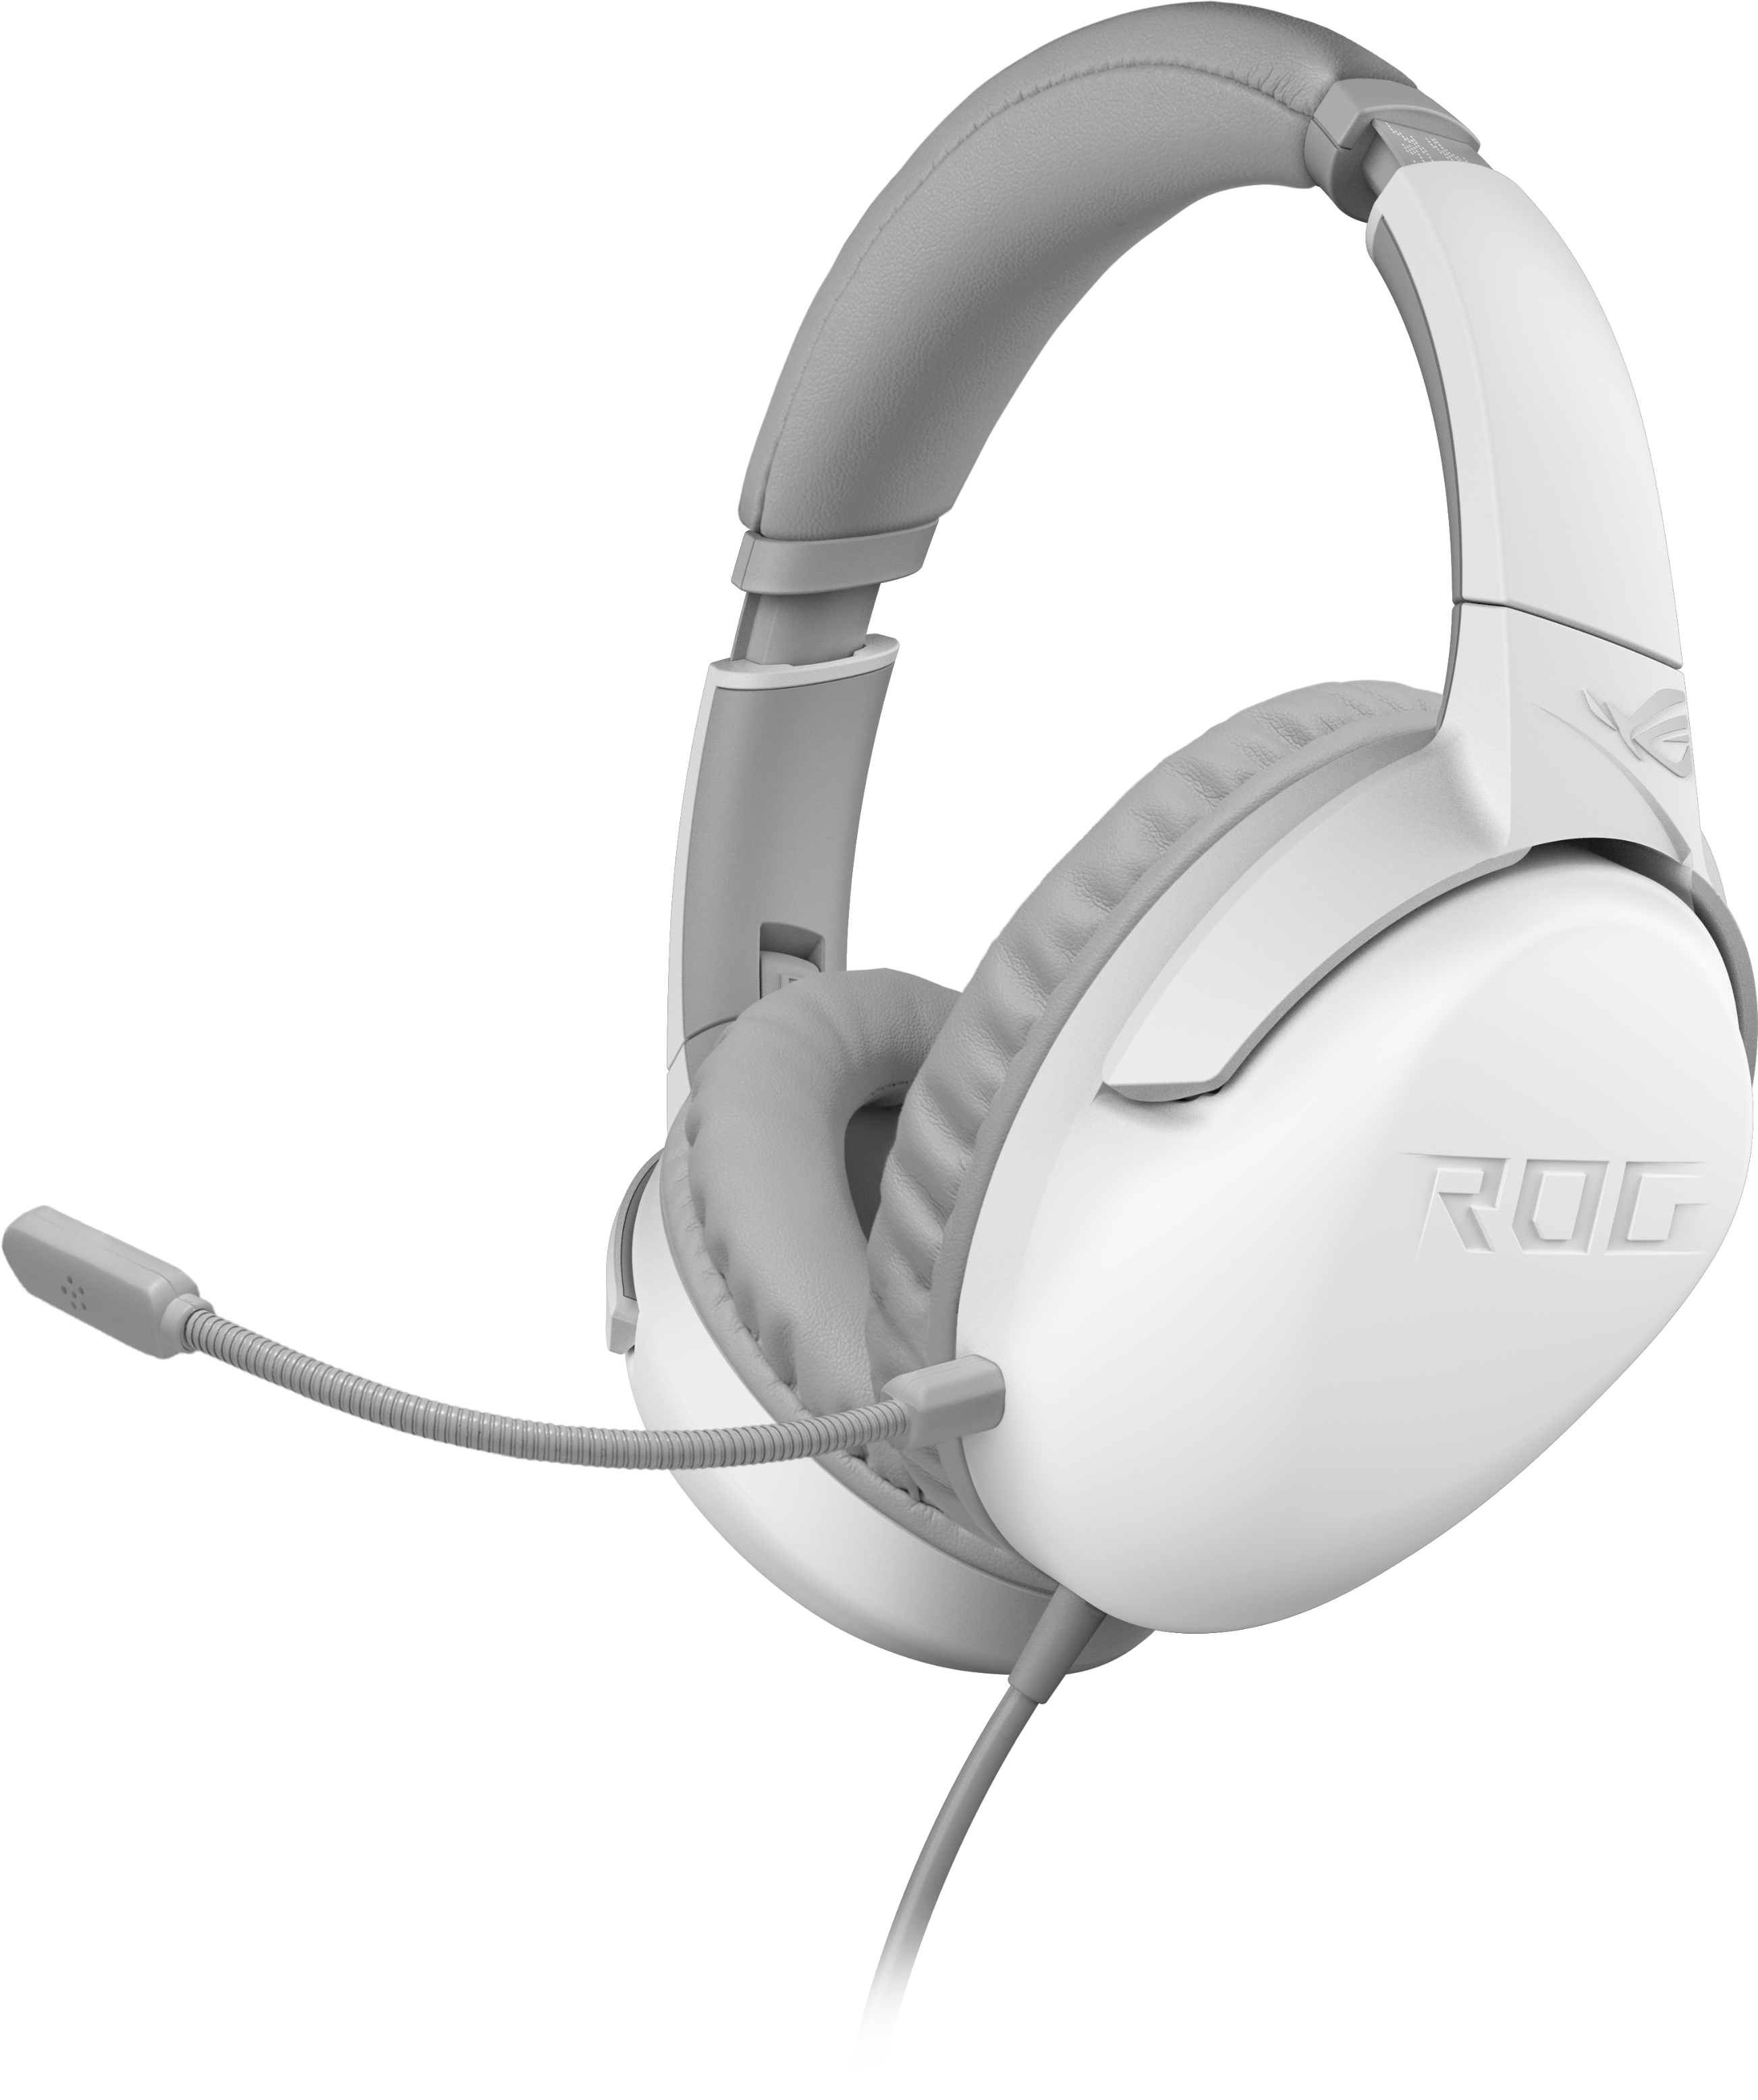 Геймърски слушалки ASUS ROG Strix Go Core Moonlight White